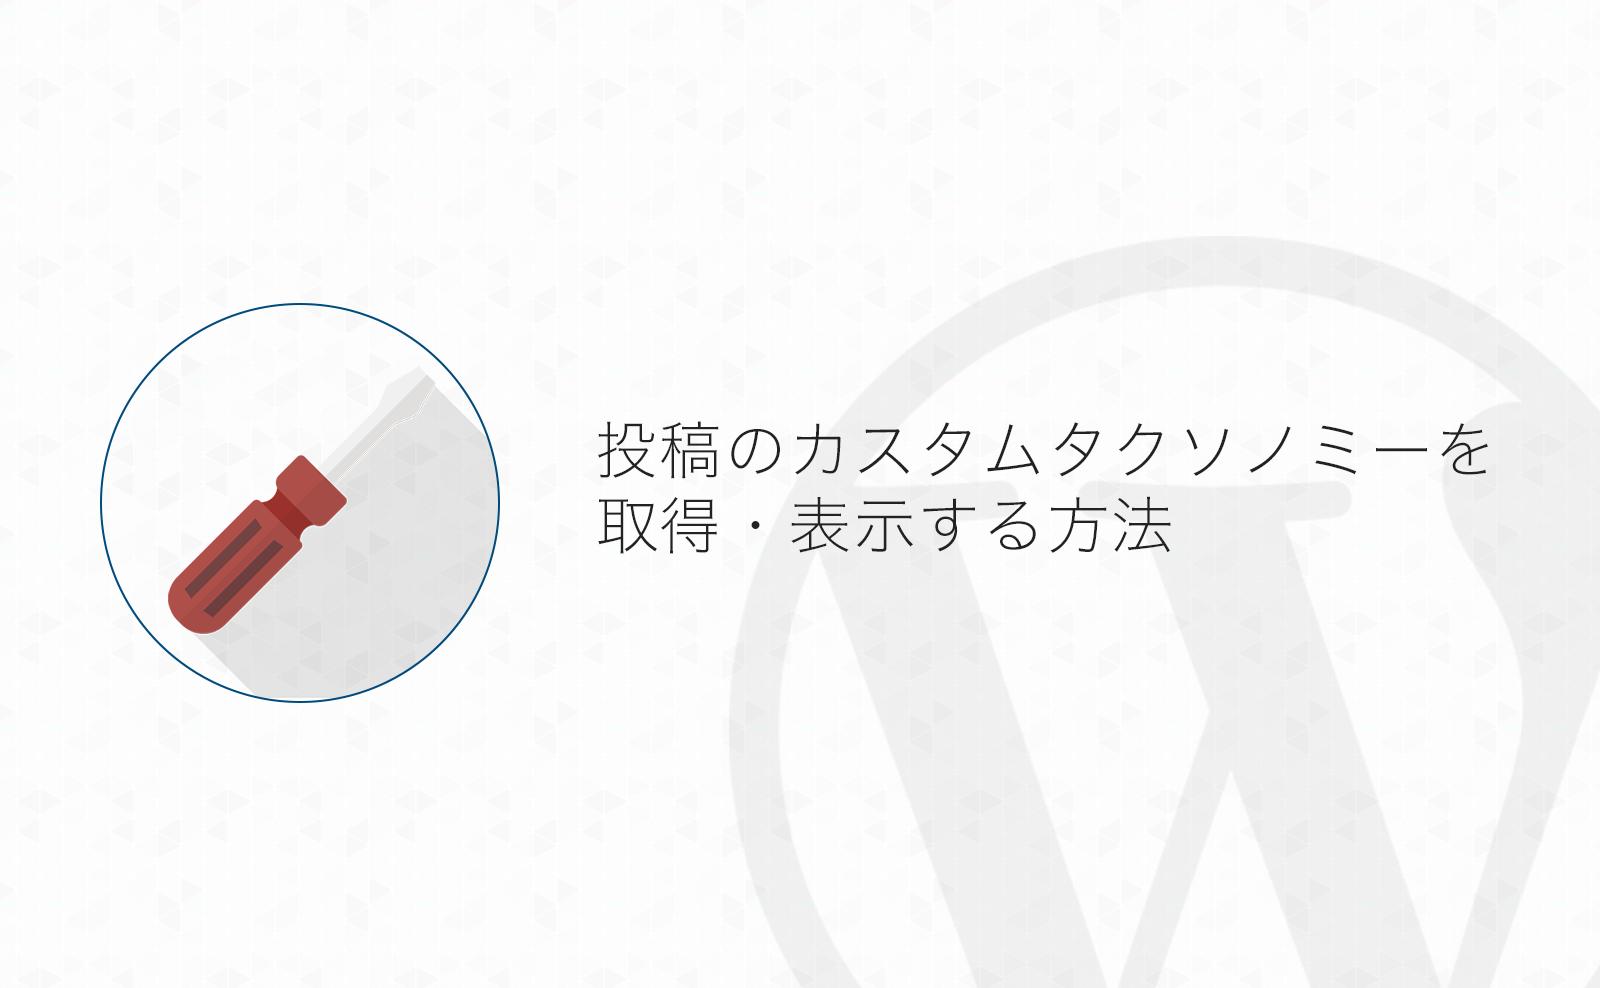 【WordPress】投稿についているカスタムタクソノミーを取得・表示する方法